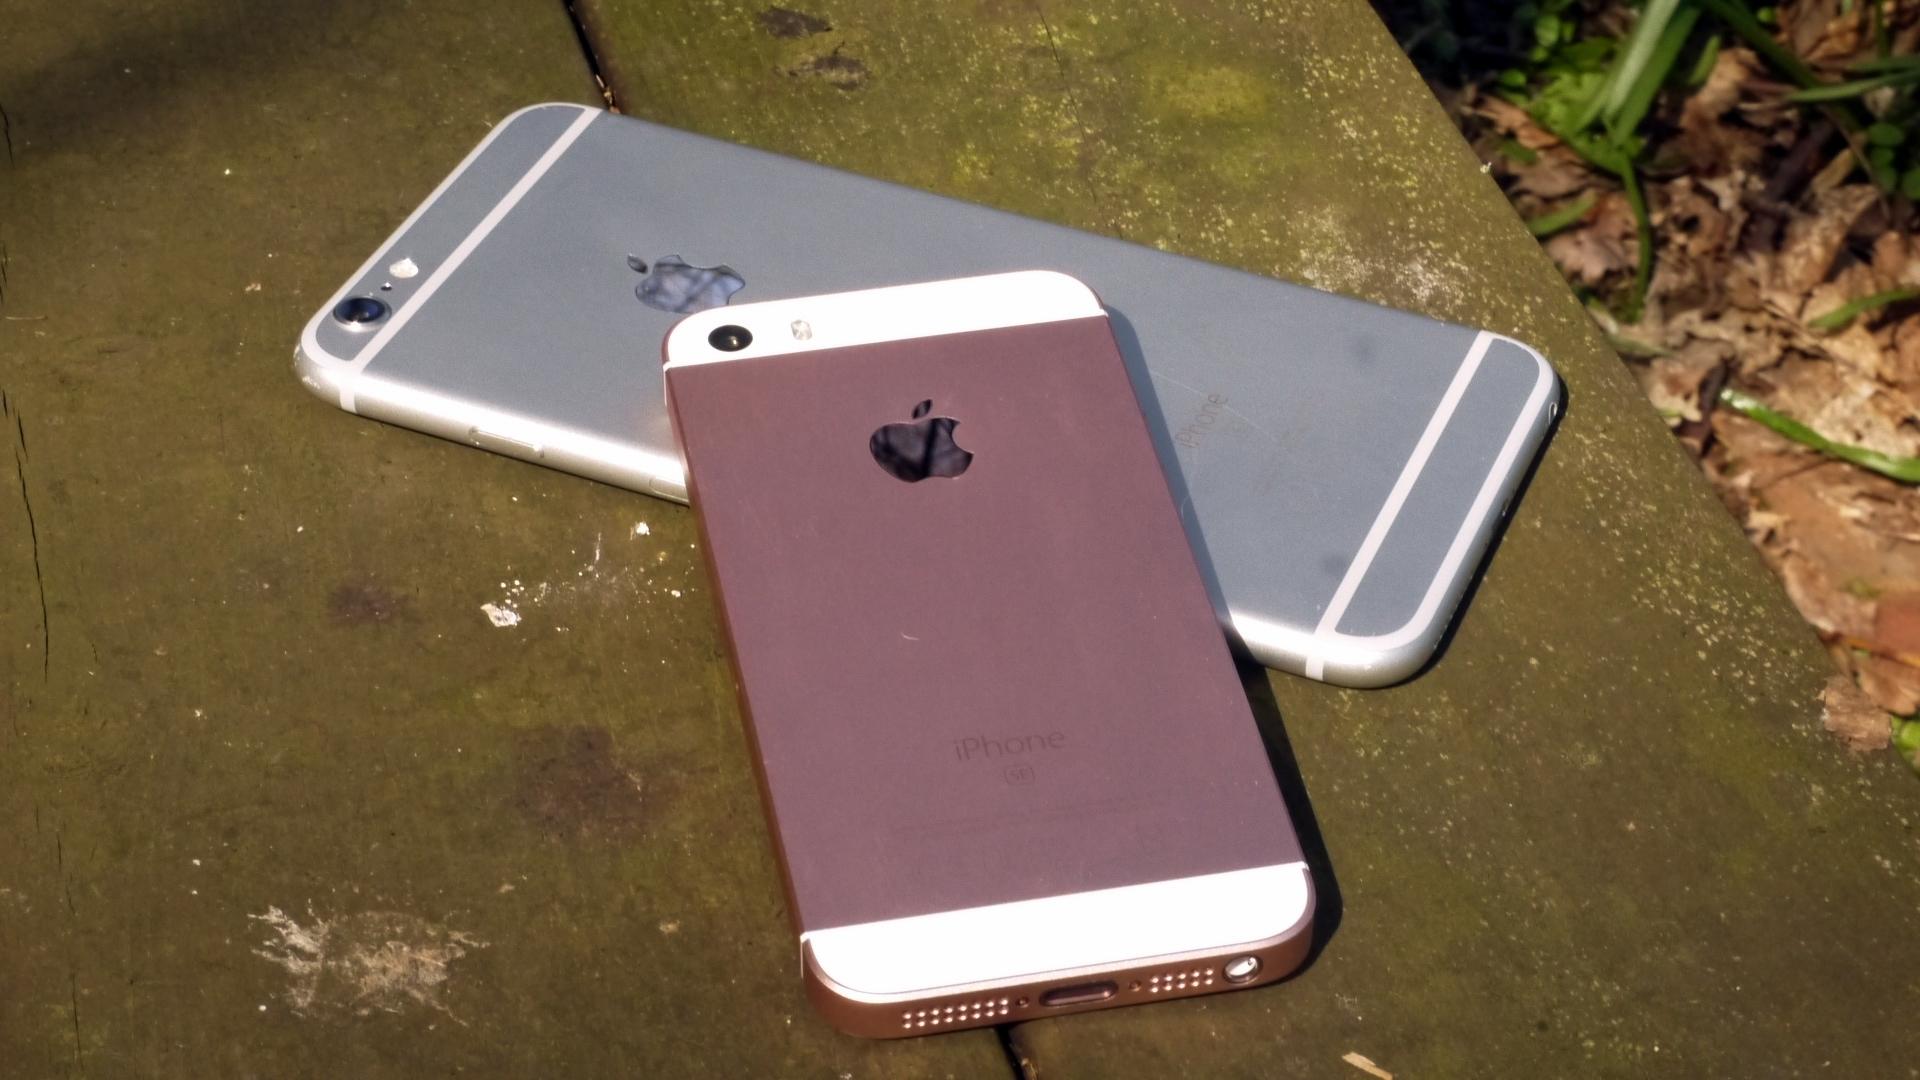 iPhone 9 release date is very, very soon, according to insider rumor